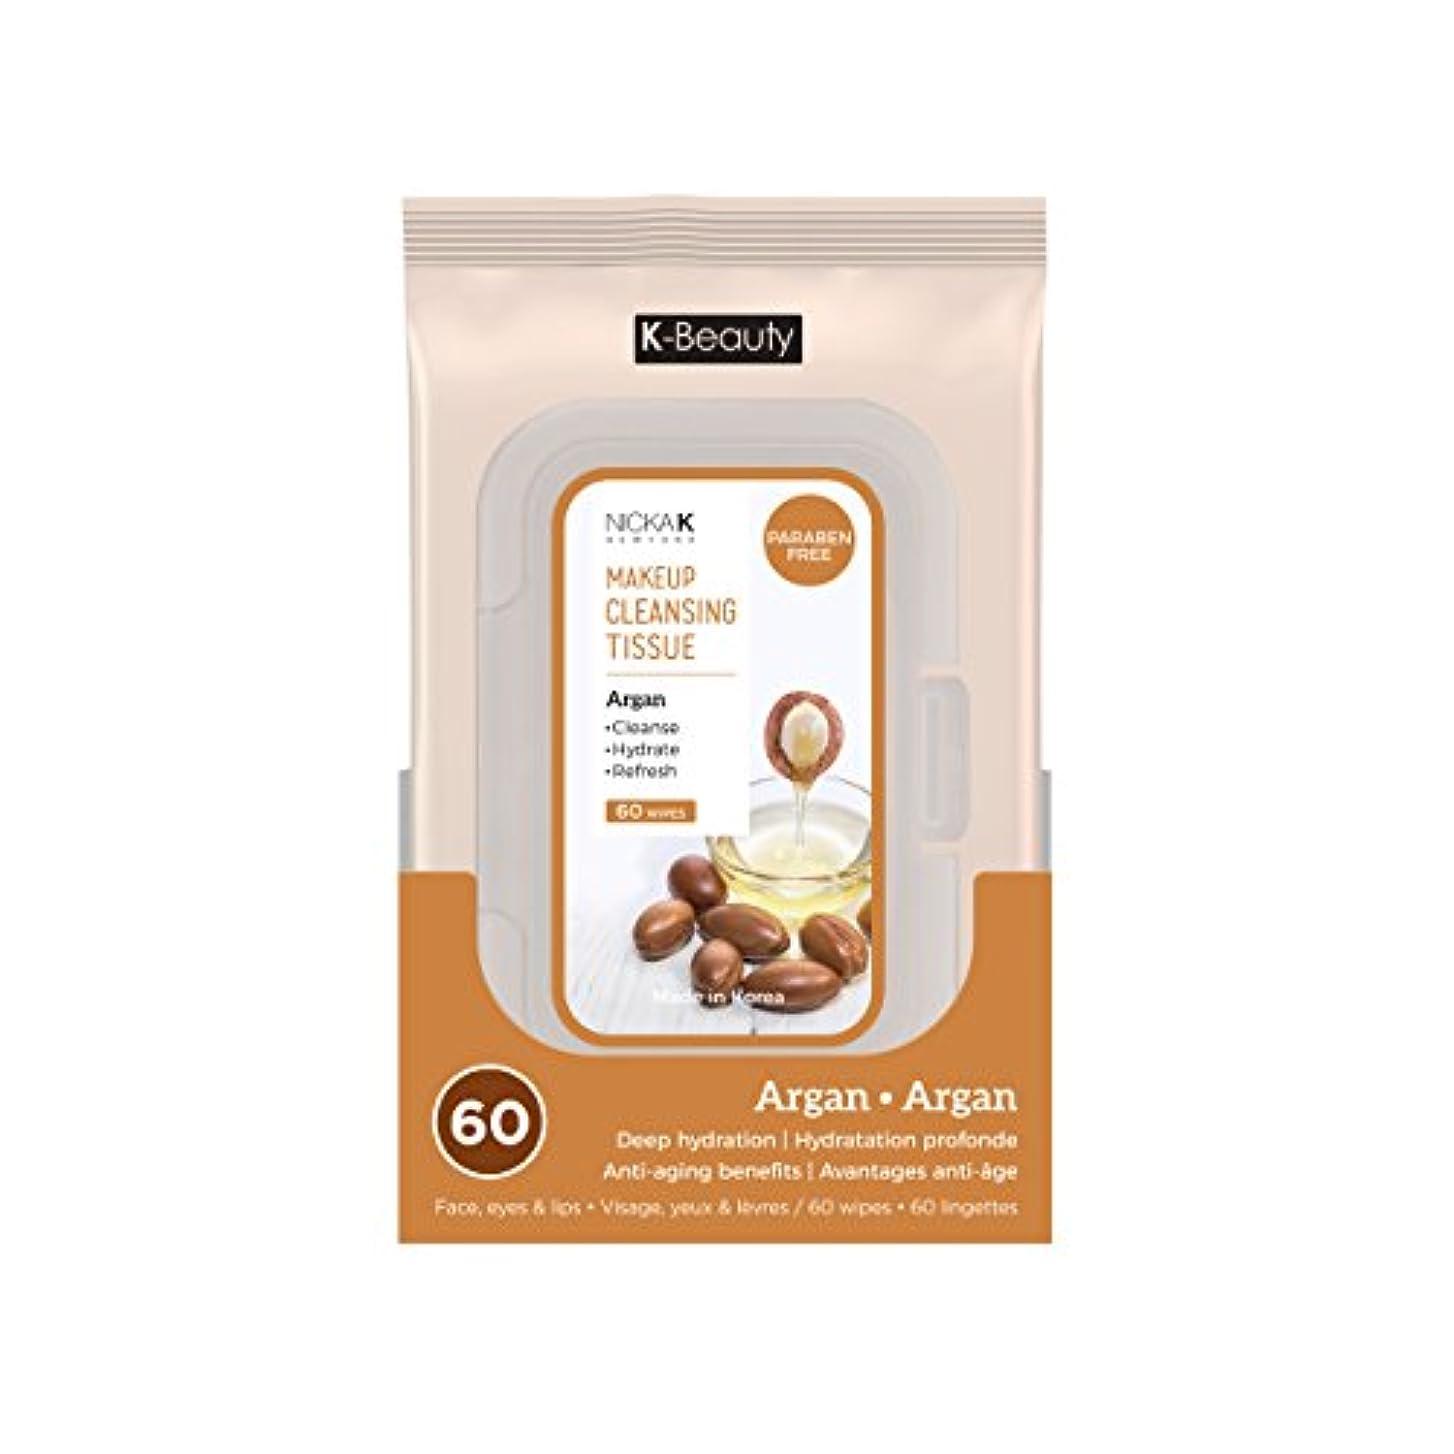 NICKA K Make Up Cleansing Tissue - Argan (並行輸入品)